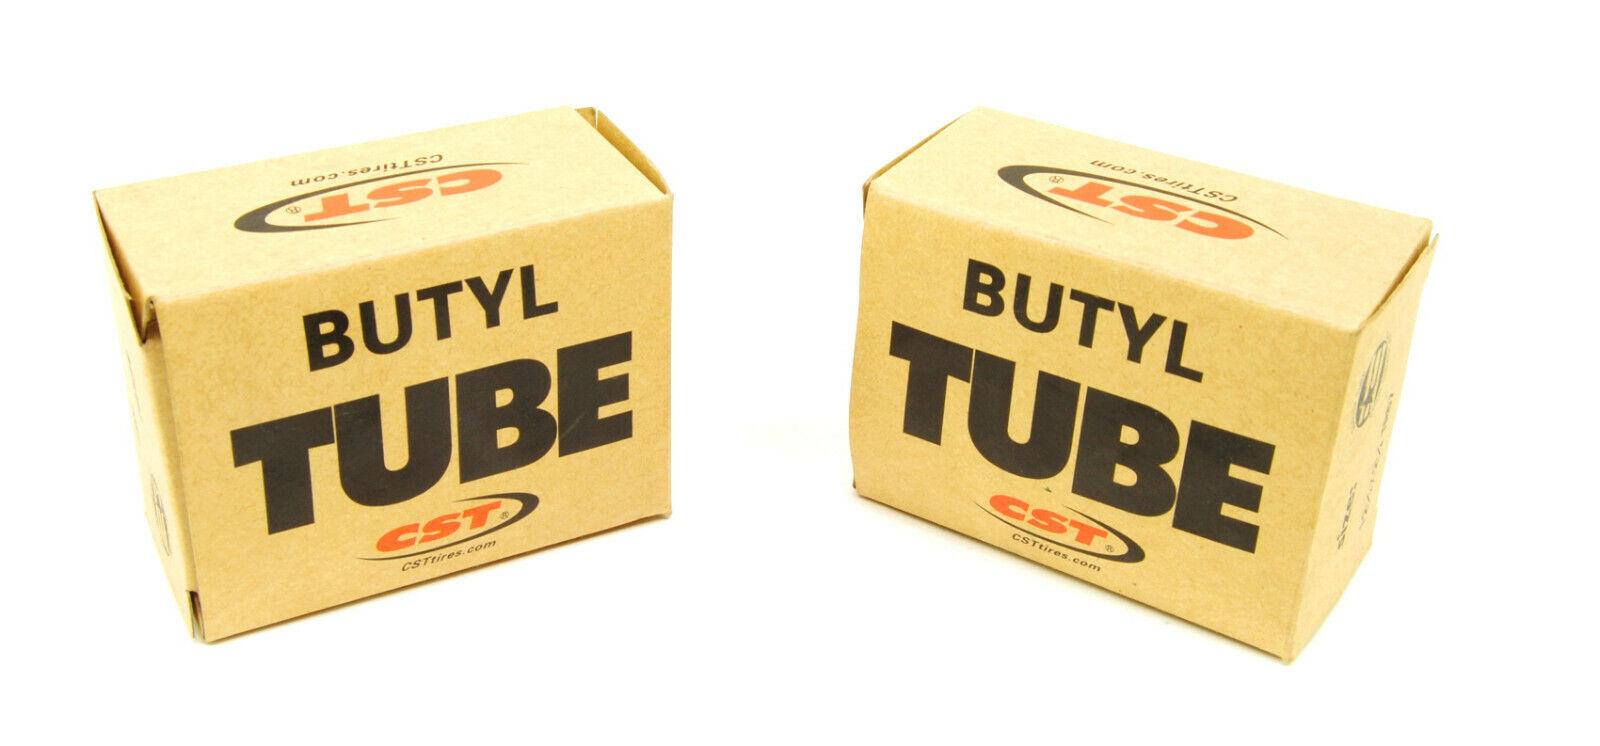 A//V Schrader 4.10// 3.50-6 Tube Duro 90//90 Degree Bent Valve 4714